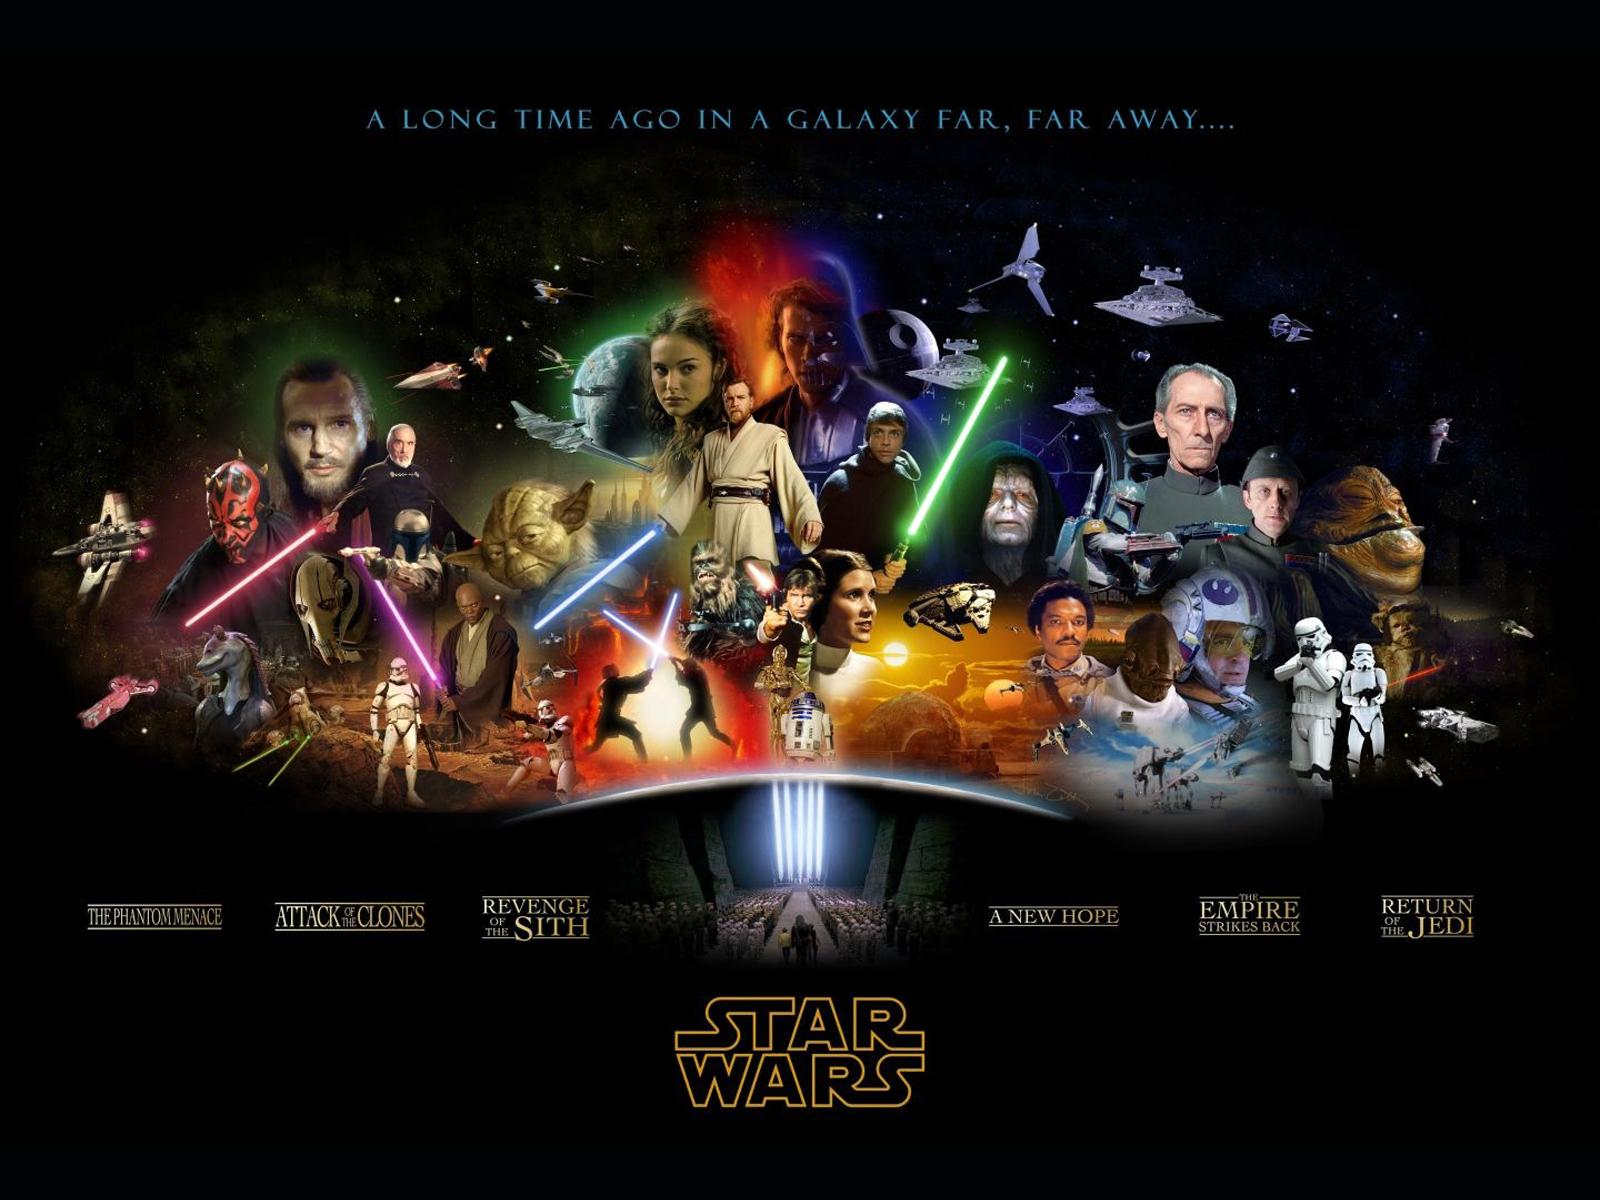 45 Free Star Wars Wallpapers And Screensavers On Wallpapersafari